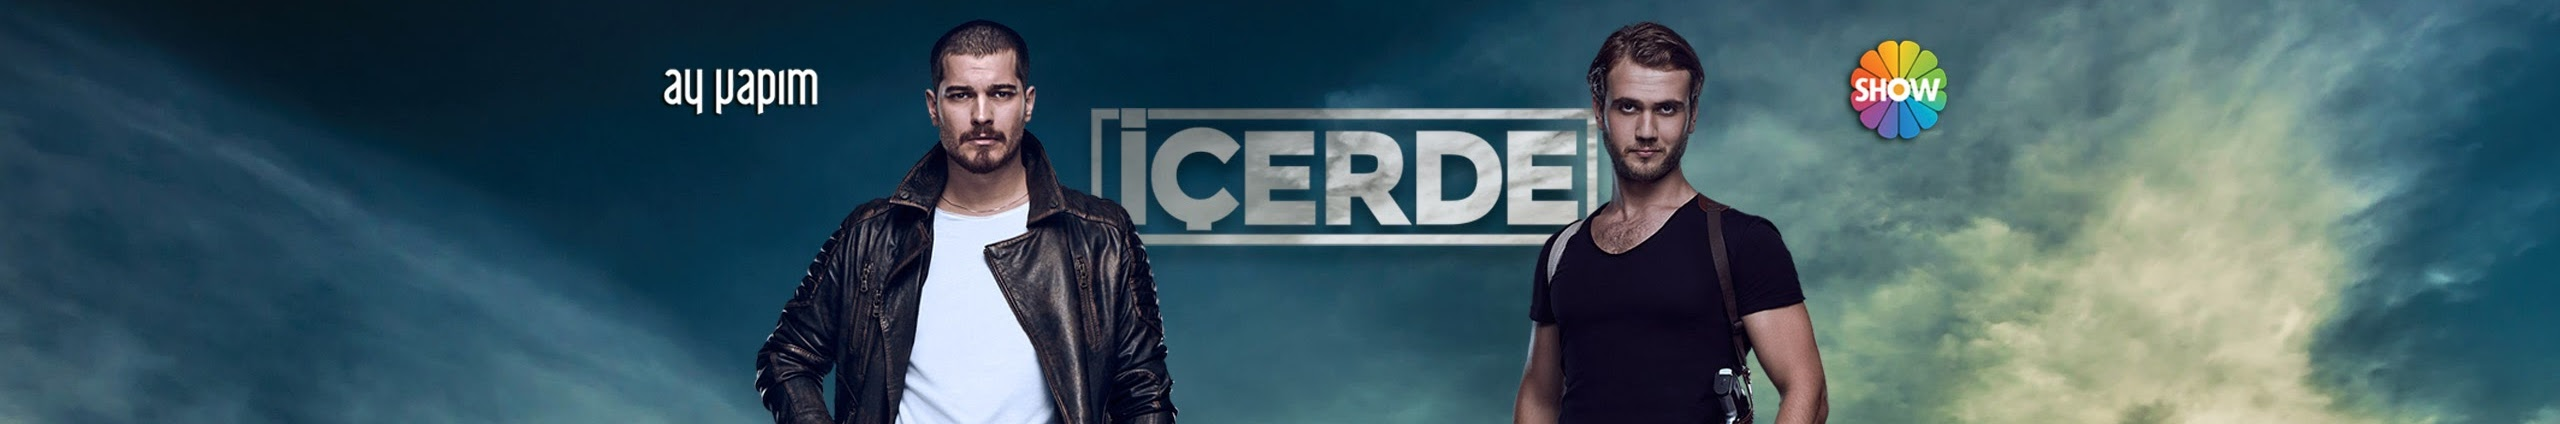 Turkish series Icerde english subtitles - TurkFans com